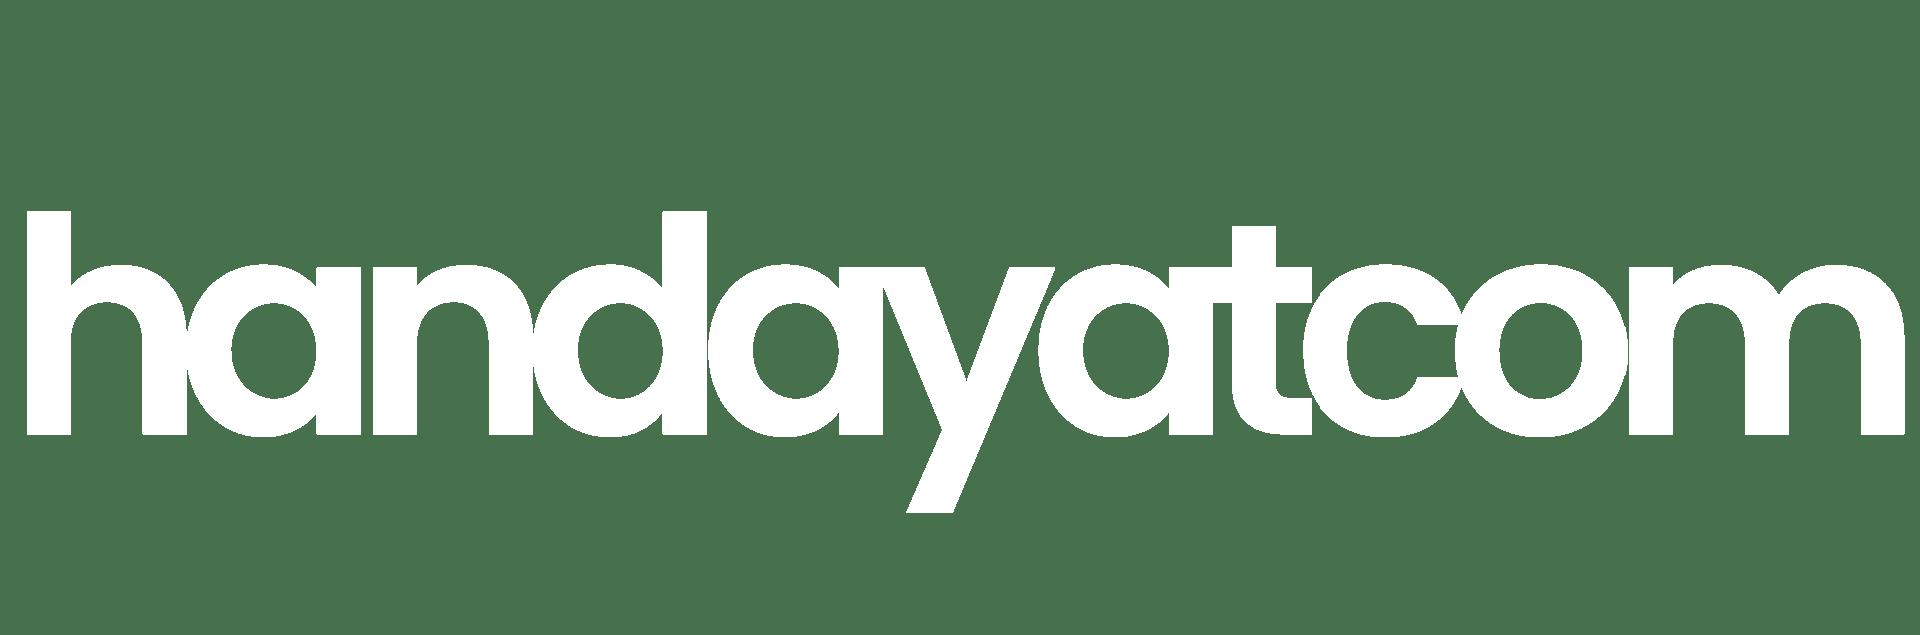 Handayat Logo